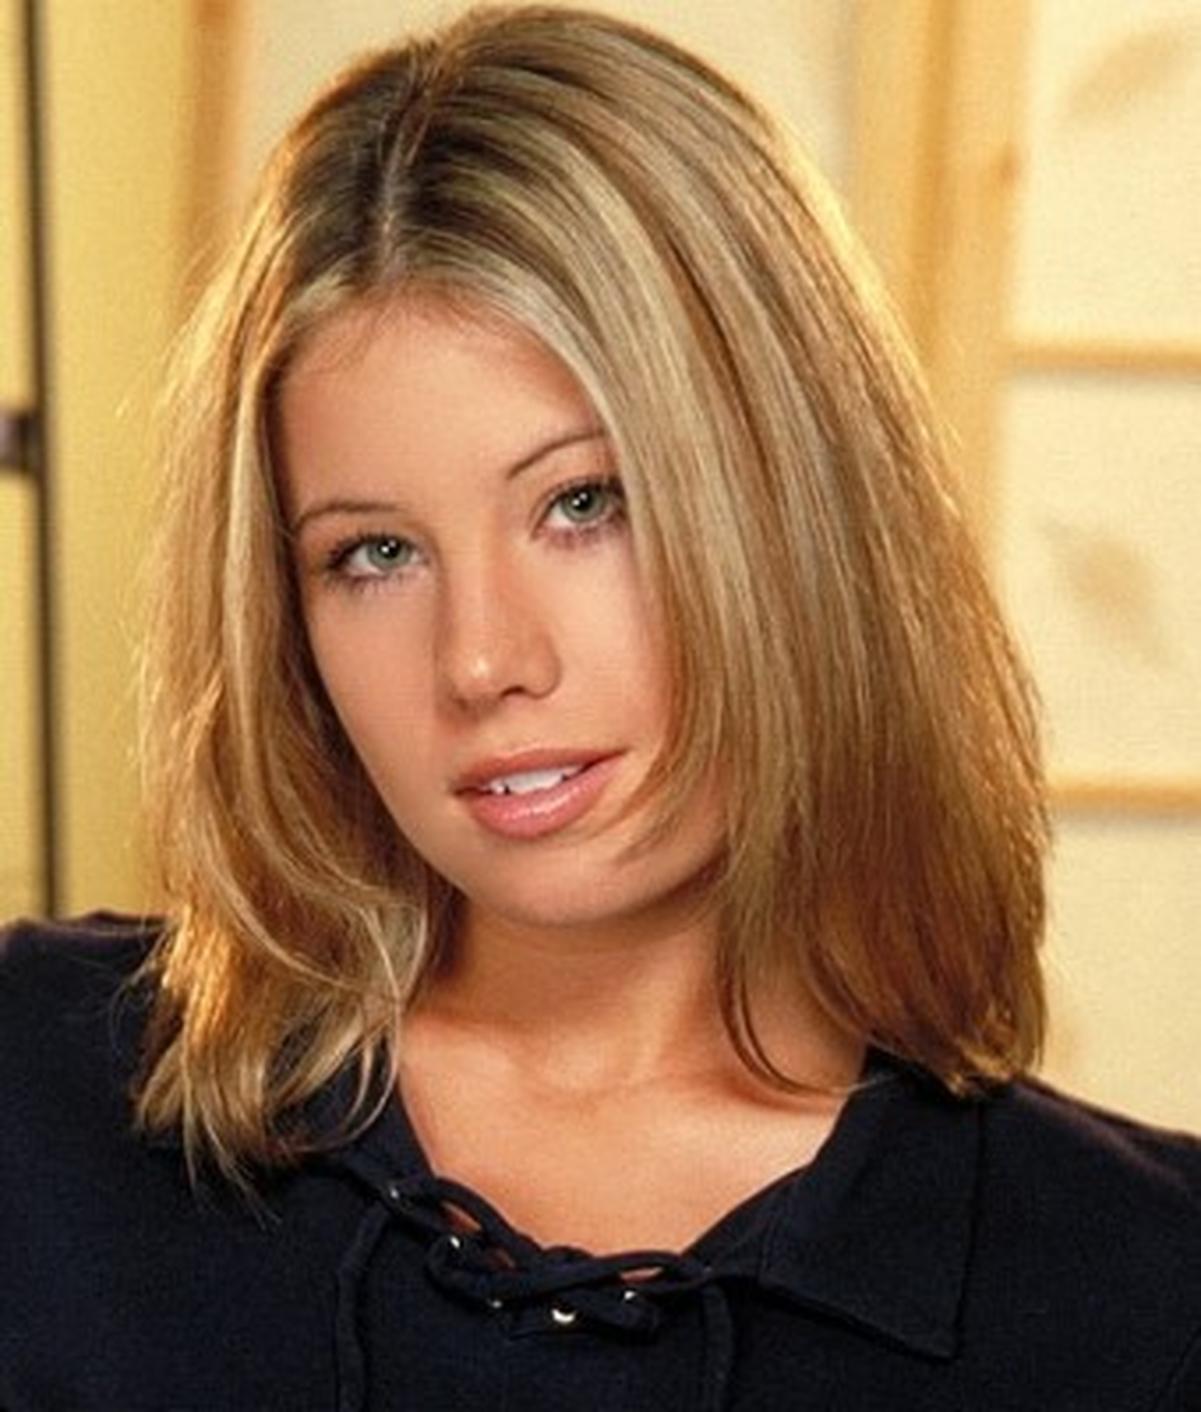 Ashley Brookes | Wiki | Everipedia